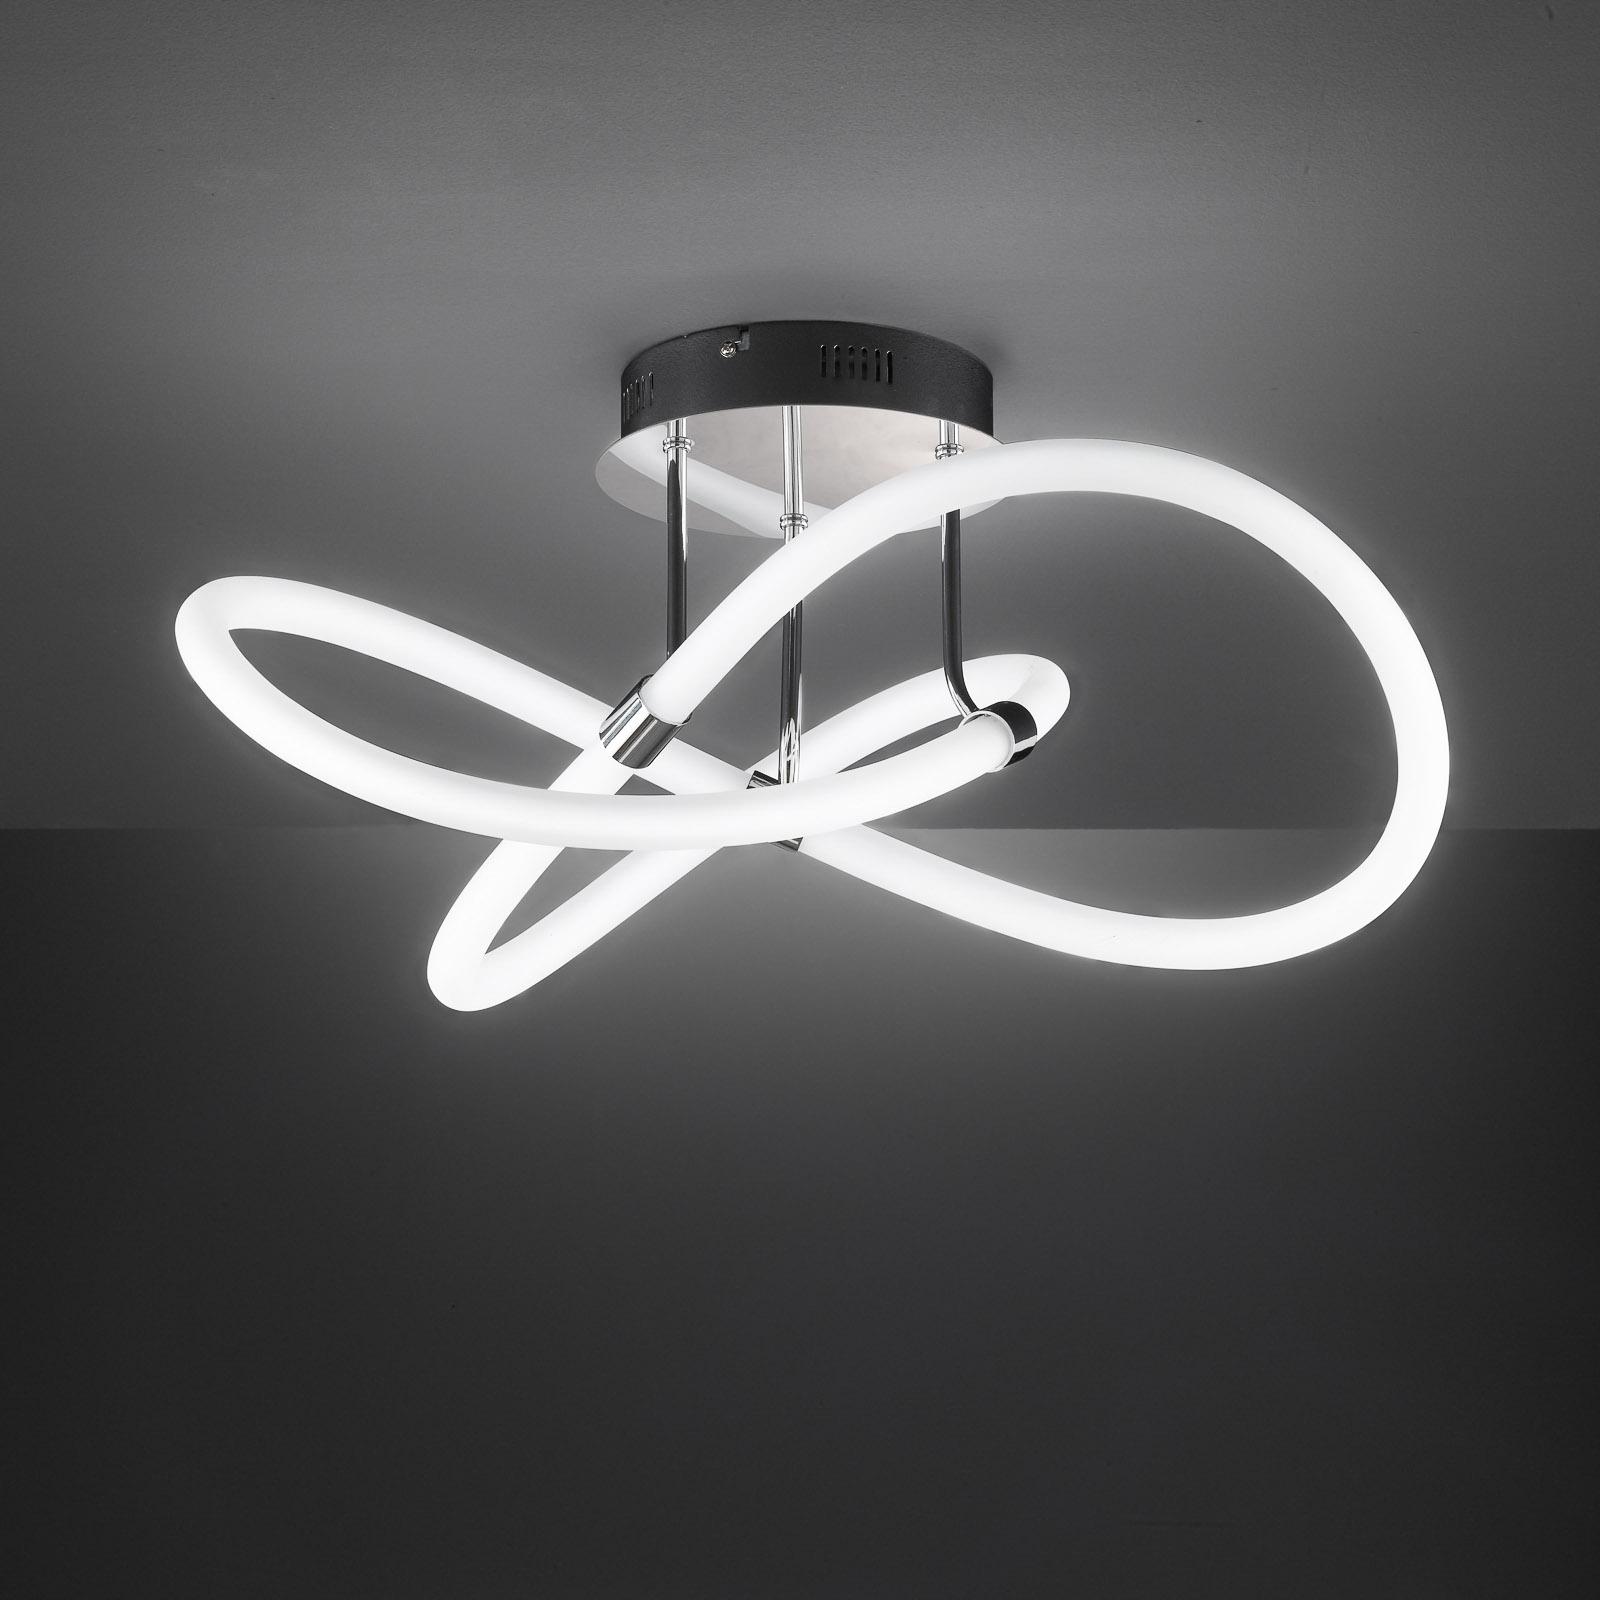 LED plafondlamp Mira met afstandsbediening Ø57,5cm